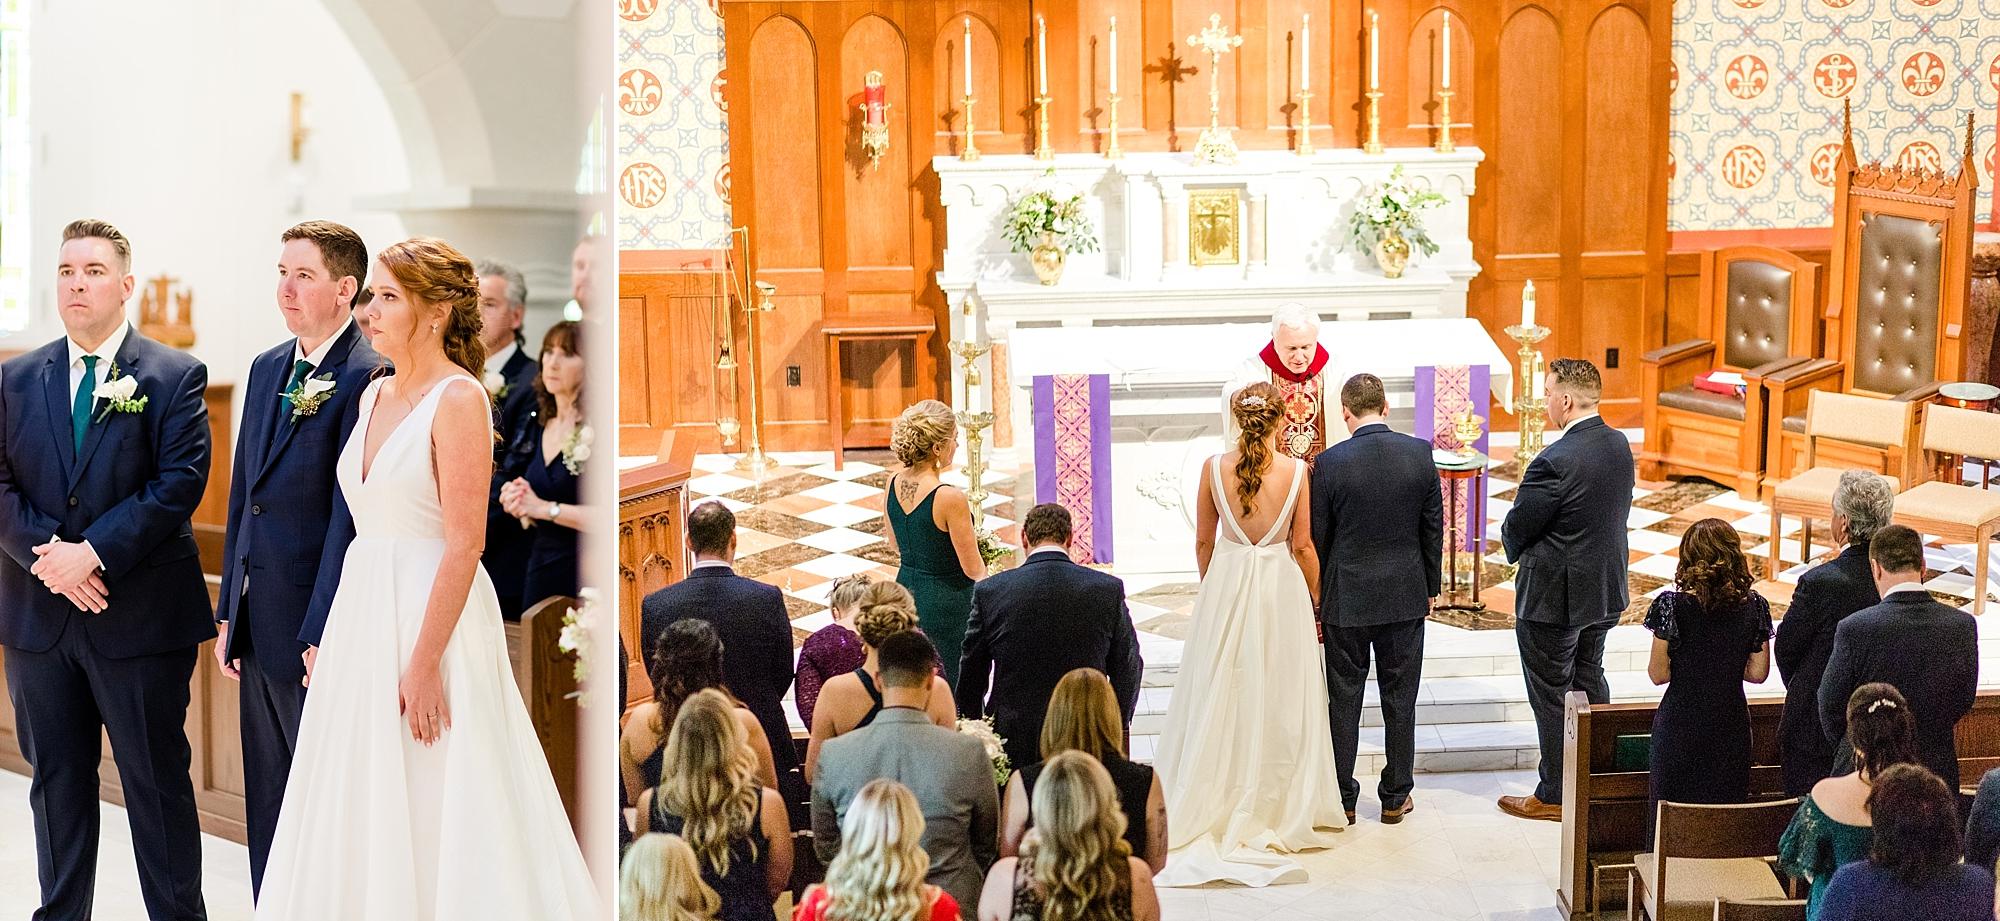 eisleyimages-irish-wedding-boston-seaport_0074.jpg